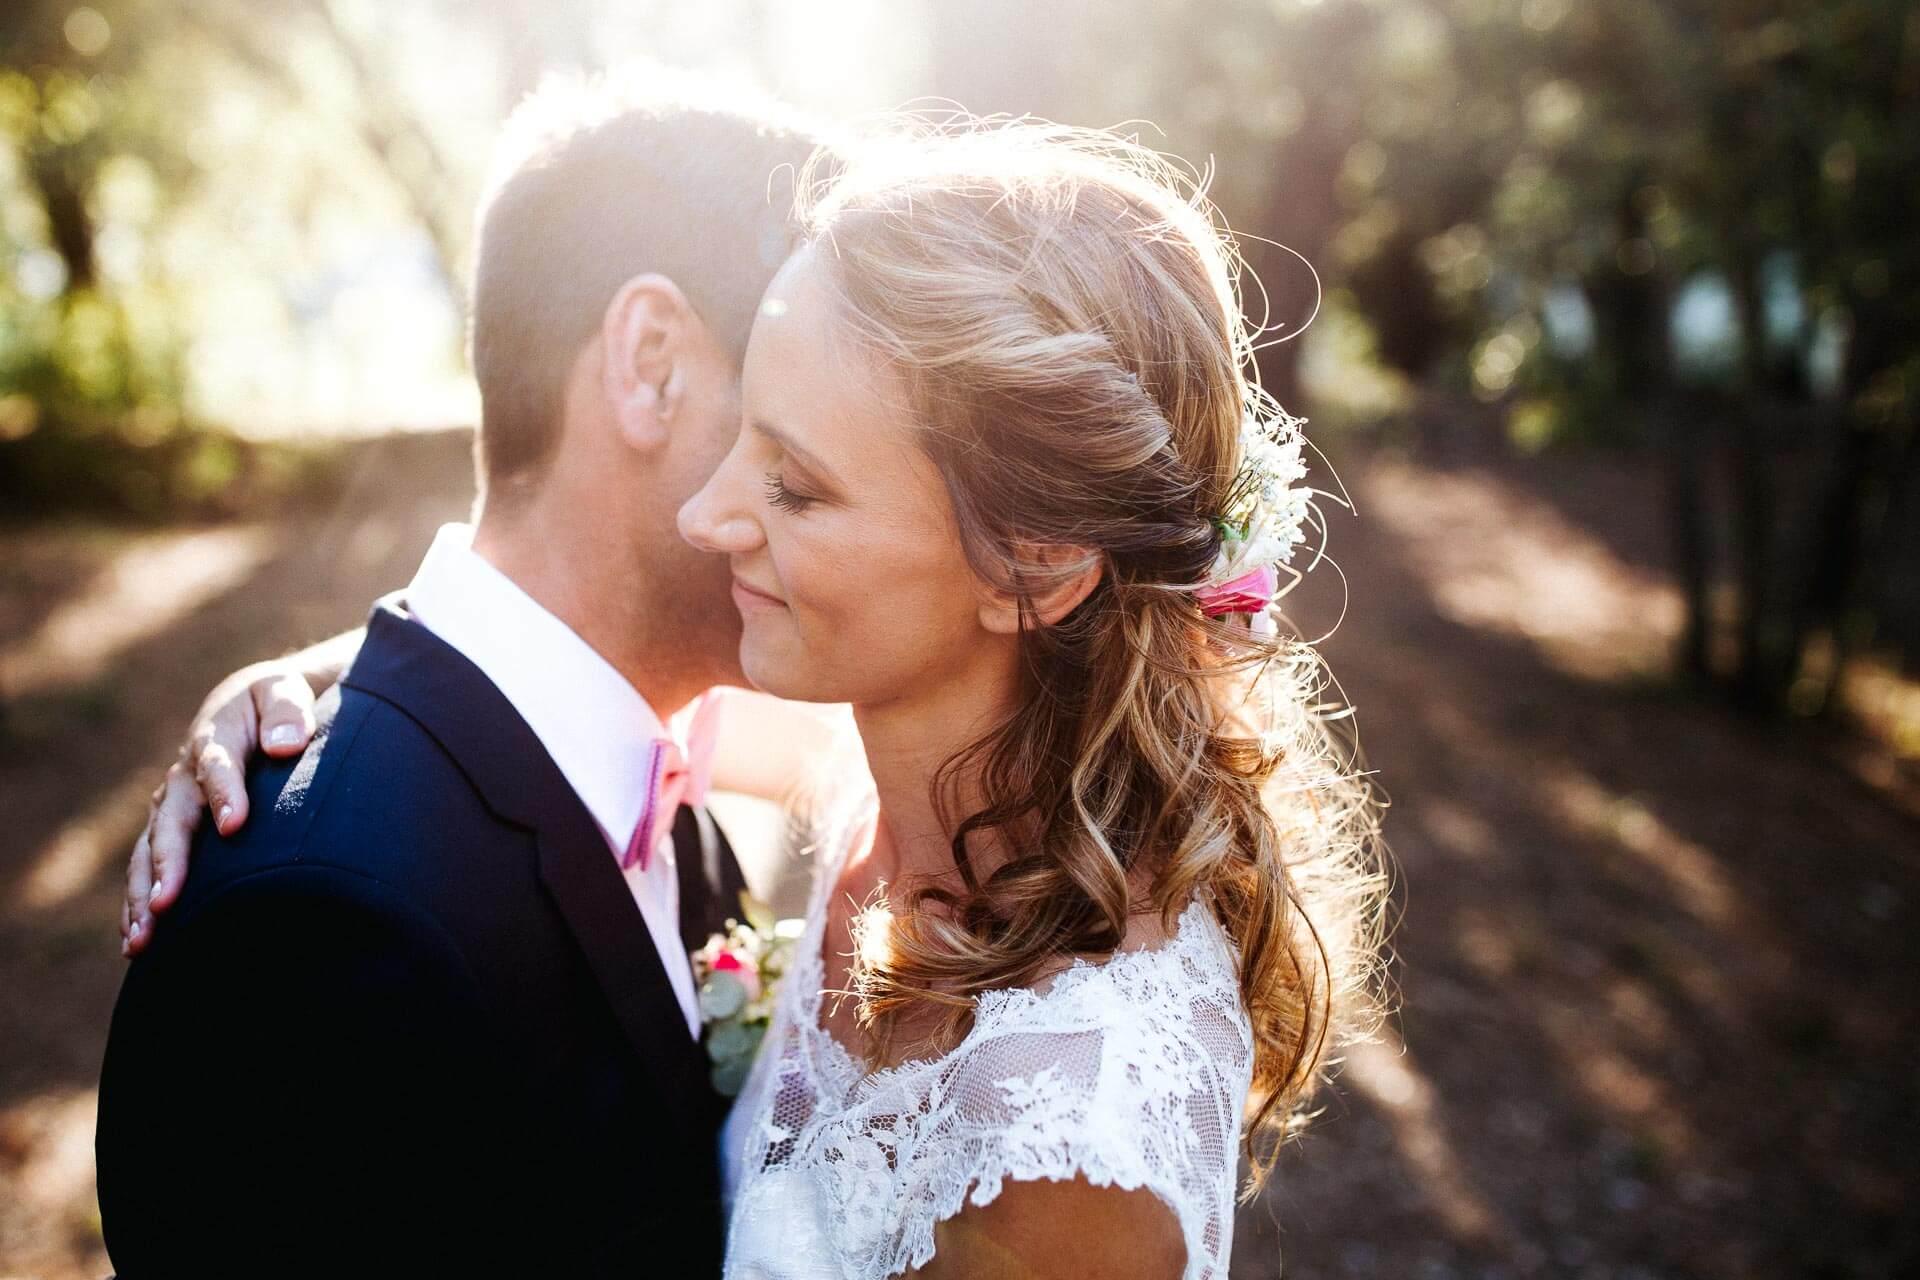 photographe-mariage-aix-en-provence-stephanie-jerome-21